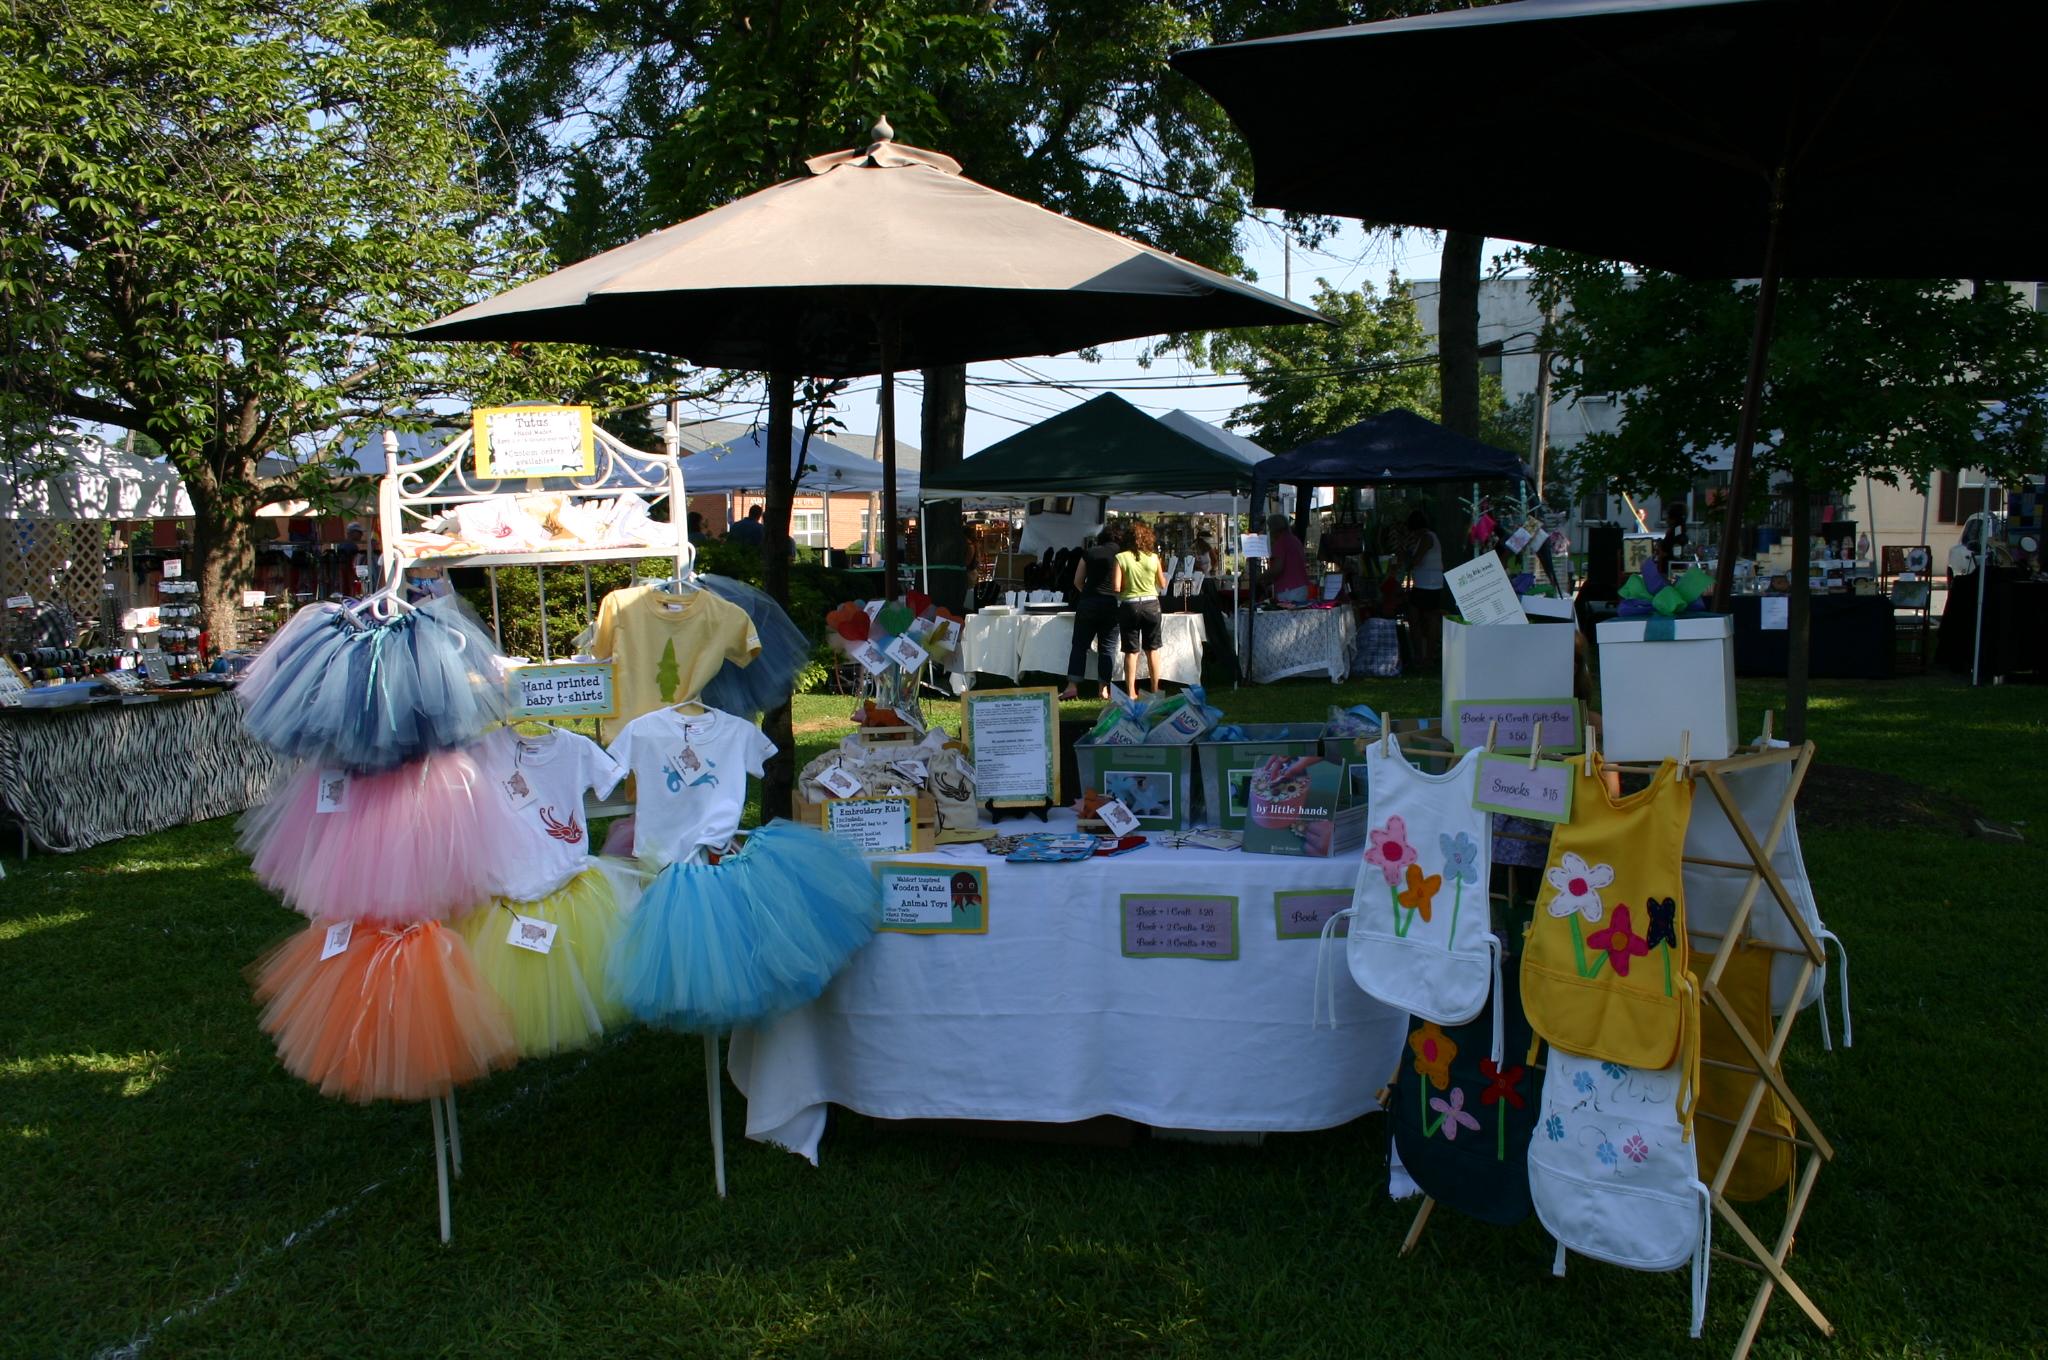 Craft fair photos 09 039 & My Sweet Babu: how goes the craft show?